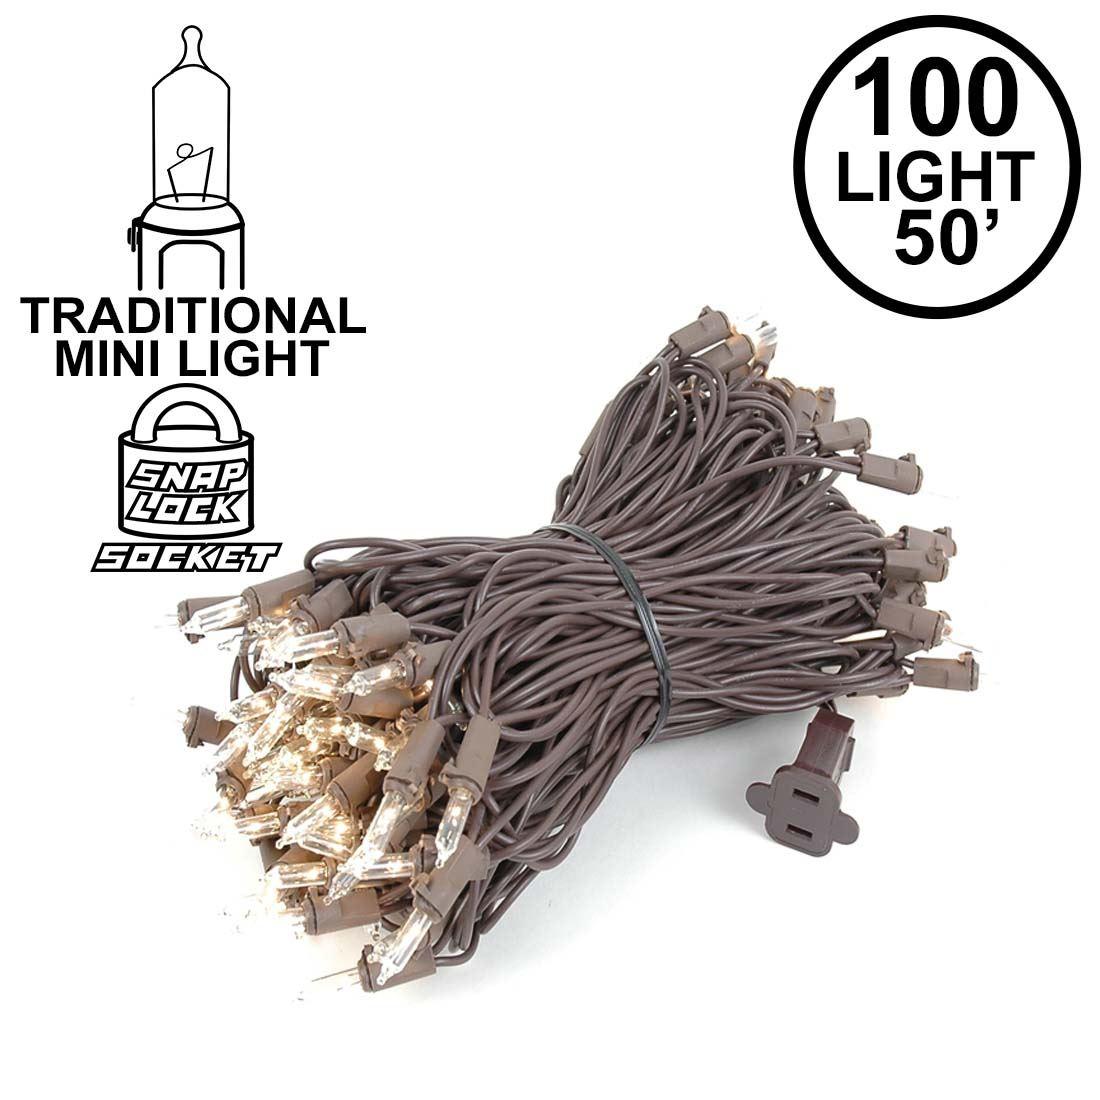 Novelty Lights 100 Light Clear Christmas Mini Light Set, 50' Long